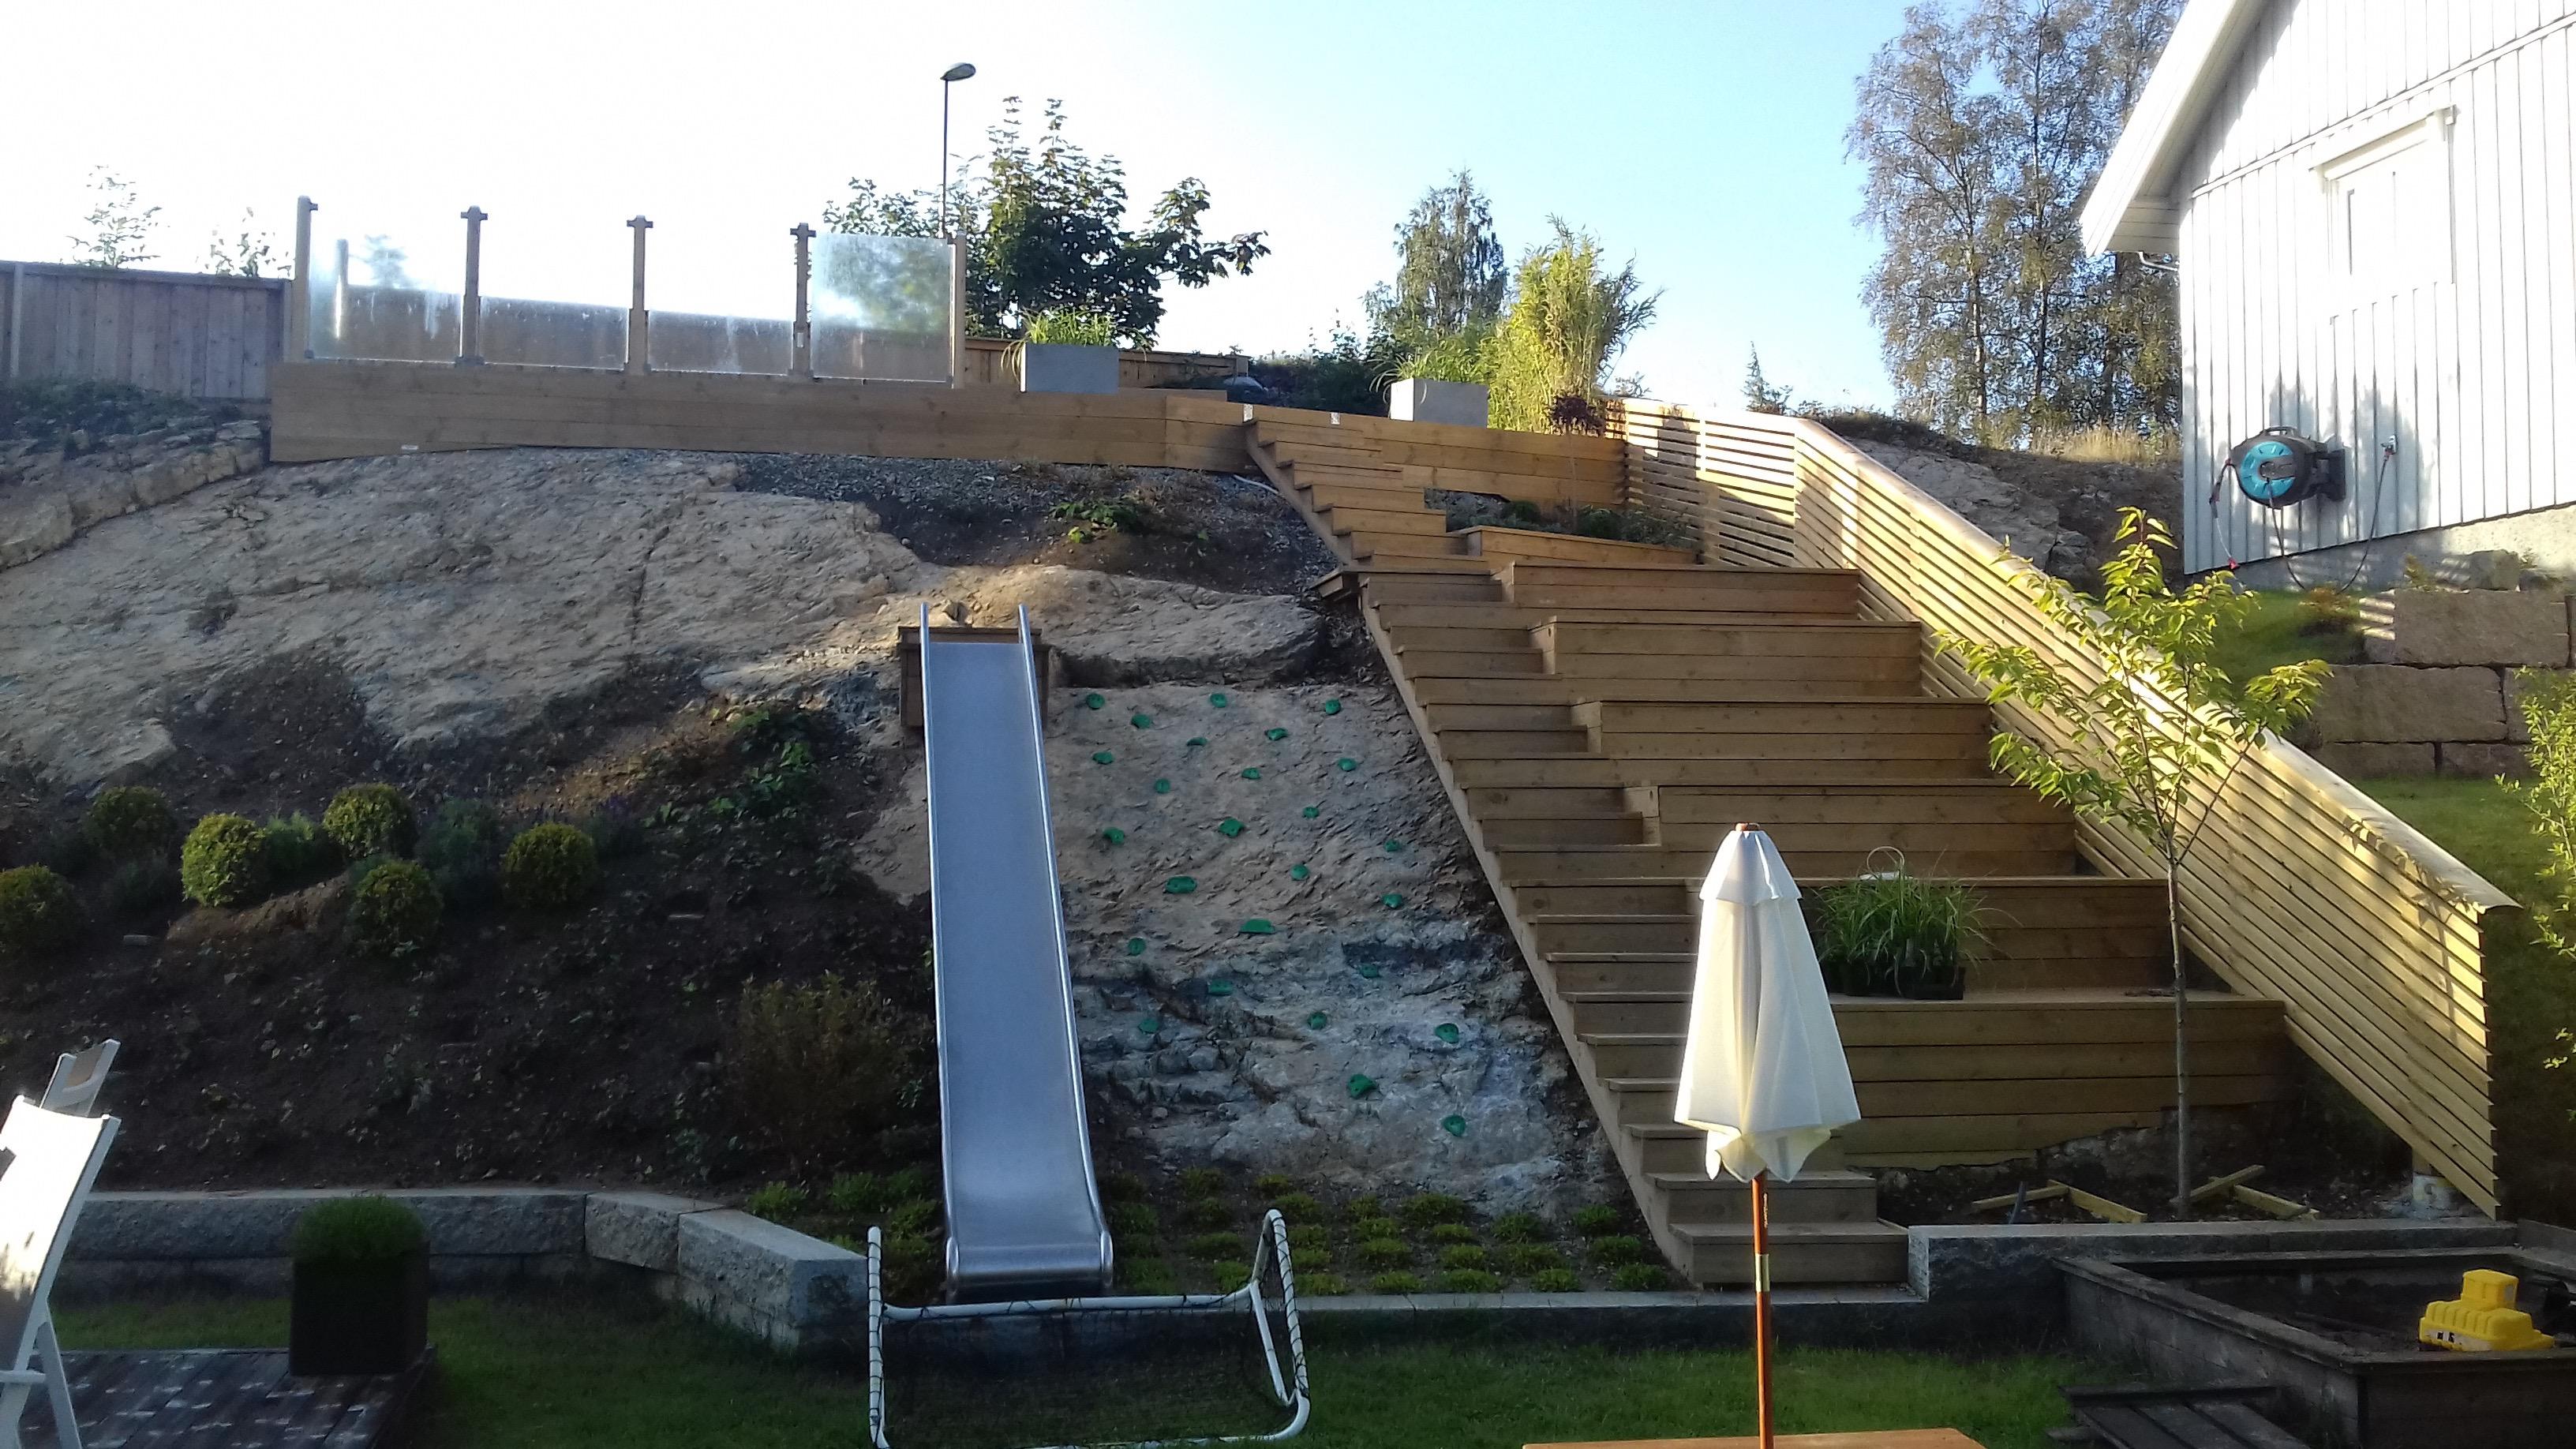 Etablere lekeområde i skråning med sklie, skråstilt klatrevegg, lekehus, trapp, terrasse.